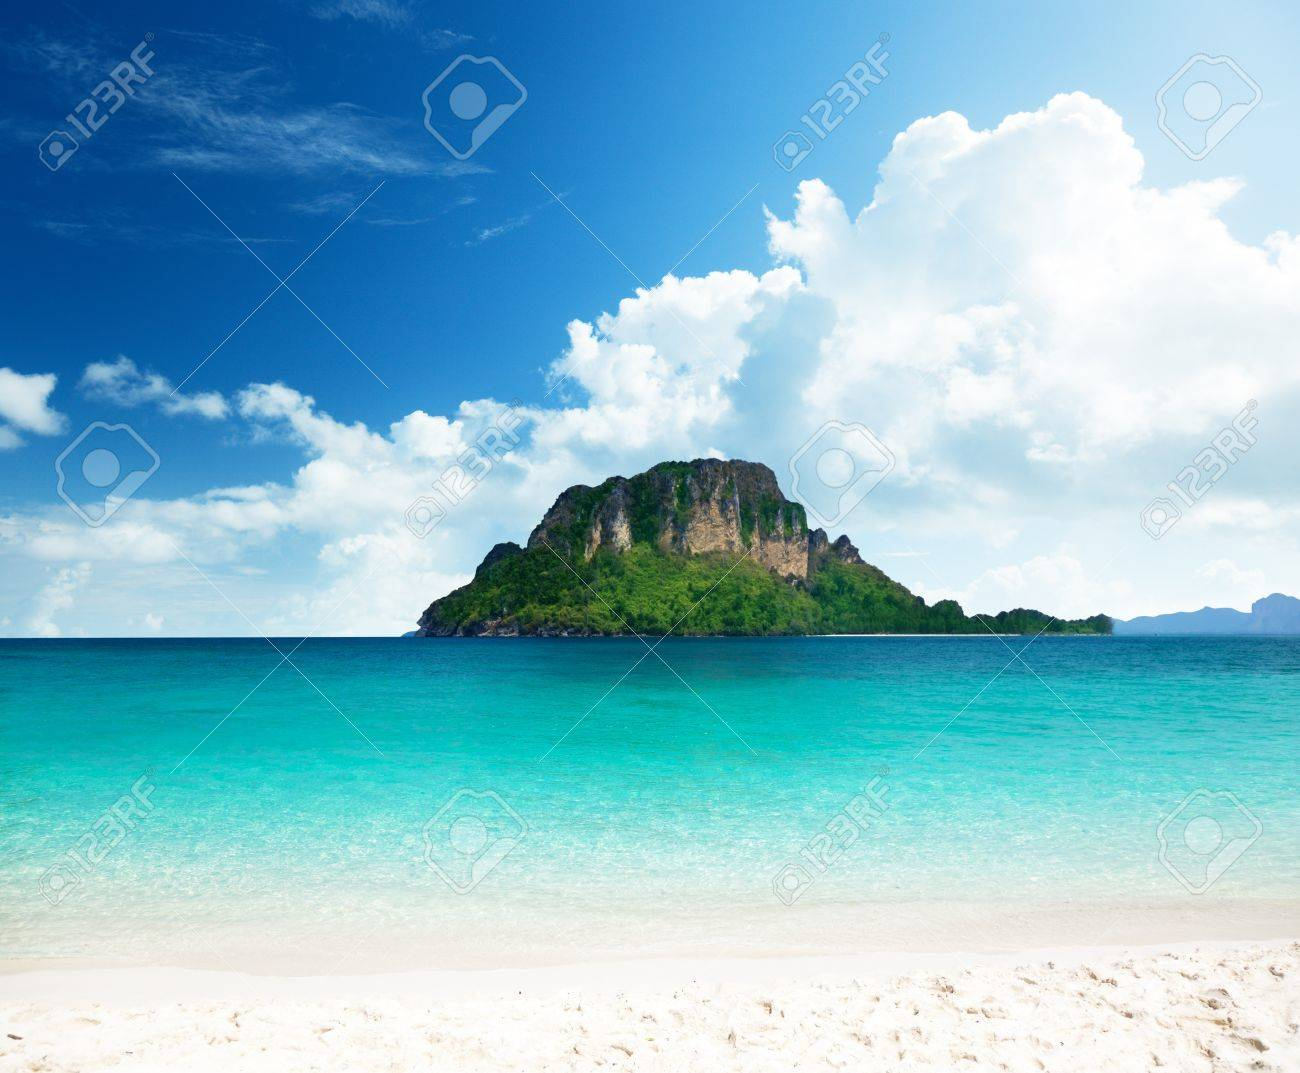 Poda island in Krabi Thailand Stock Photo - 9406436